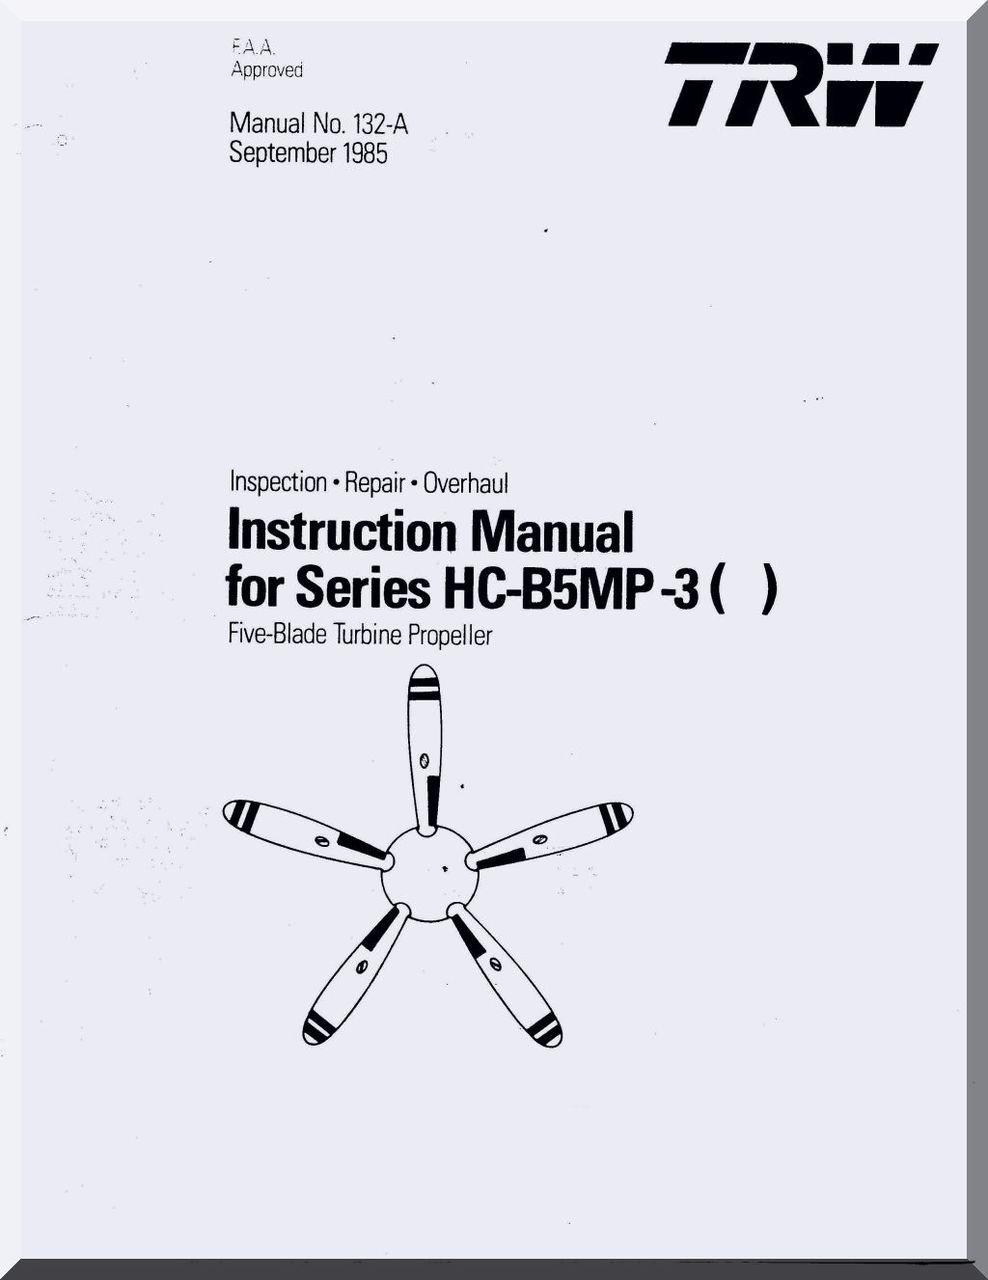 Hartzell Aircraft Propeller Instruction Manual for HC-B5MP